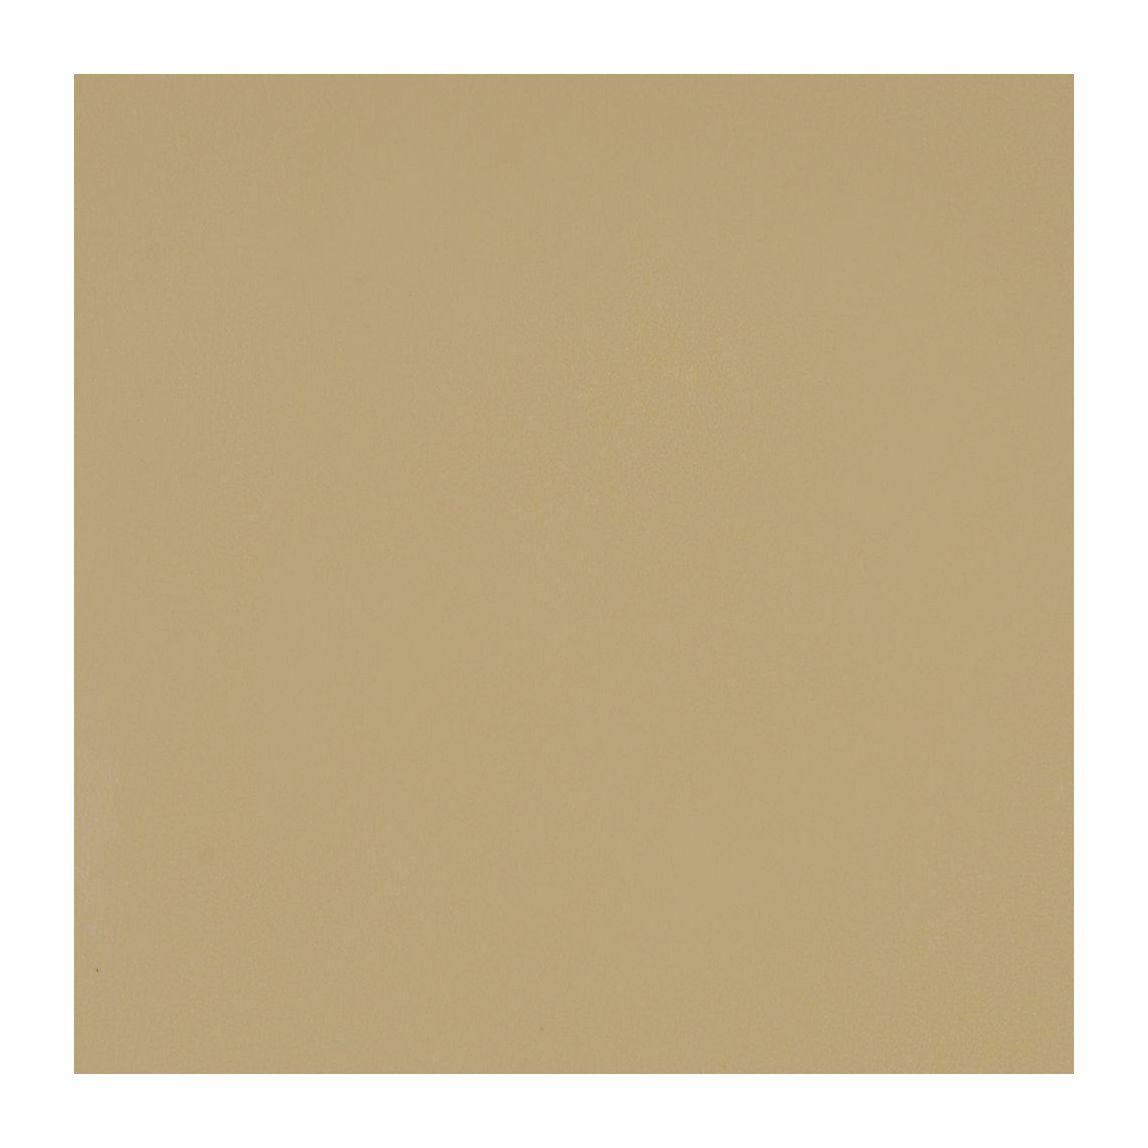 Silica Sands Swatch